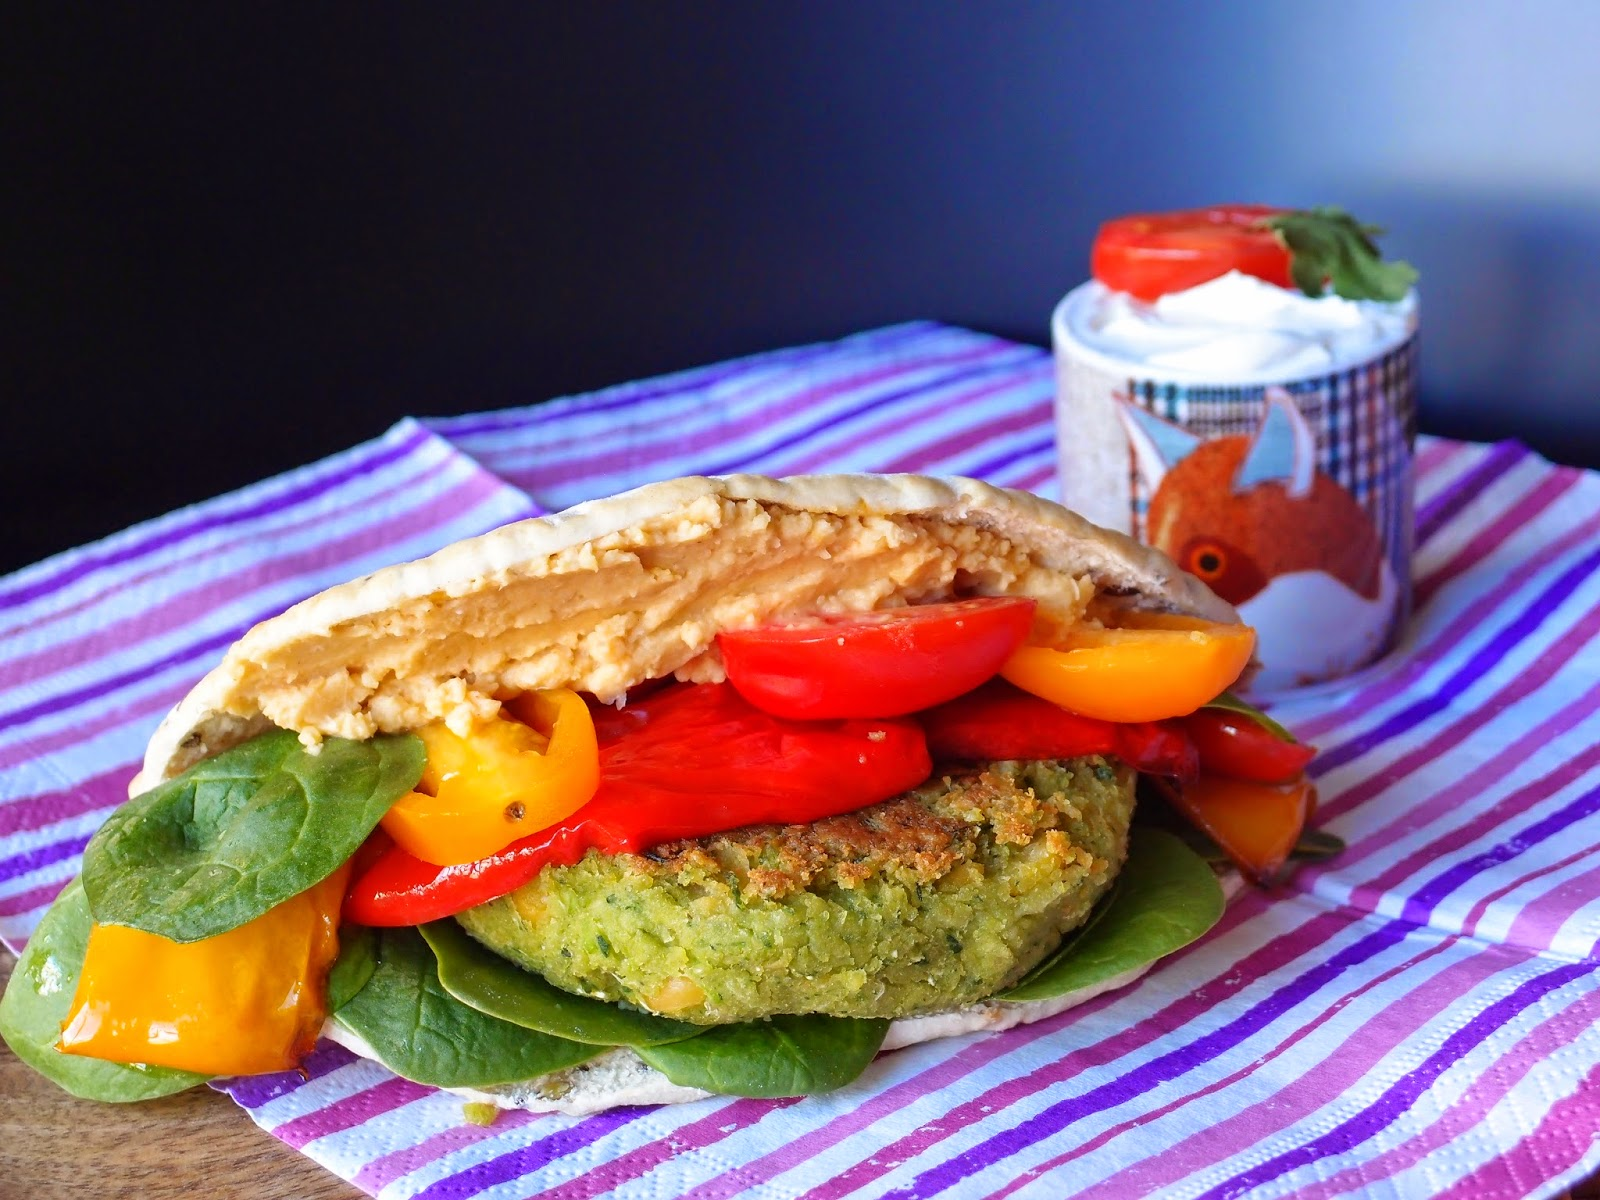 The VegHog: The VegHog's falafel burgers